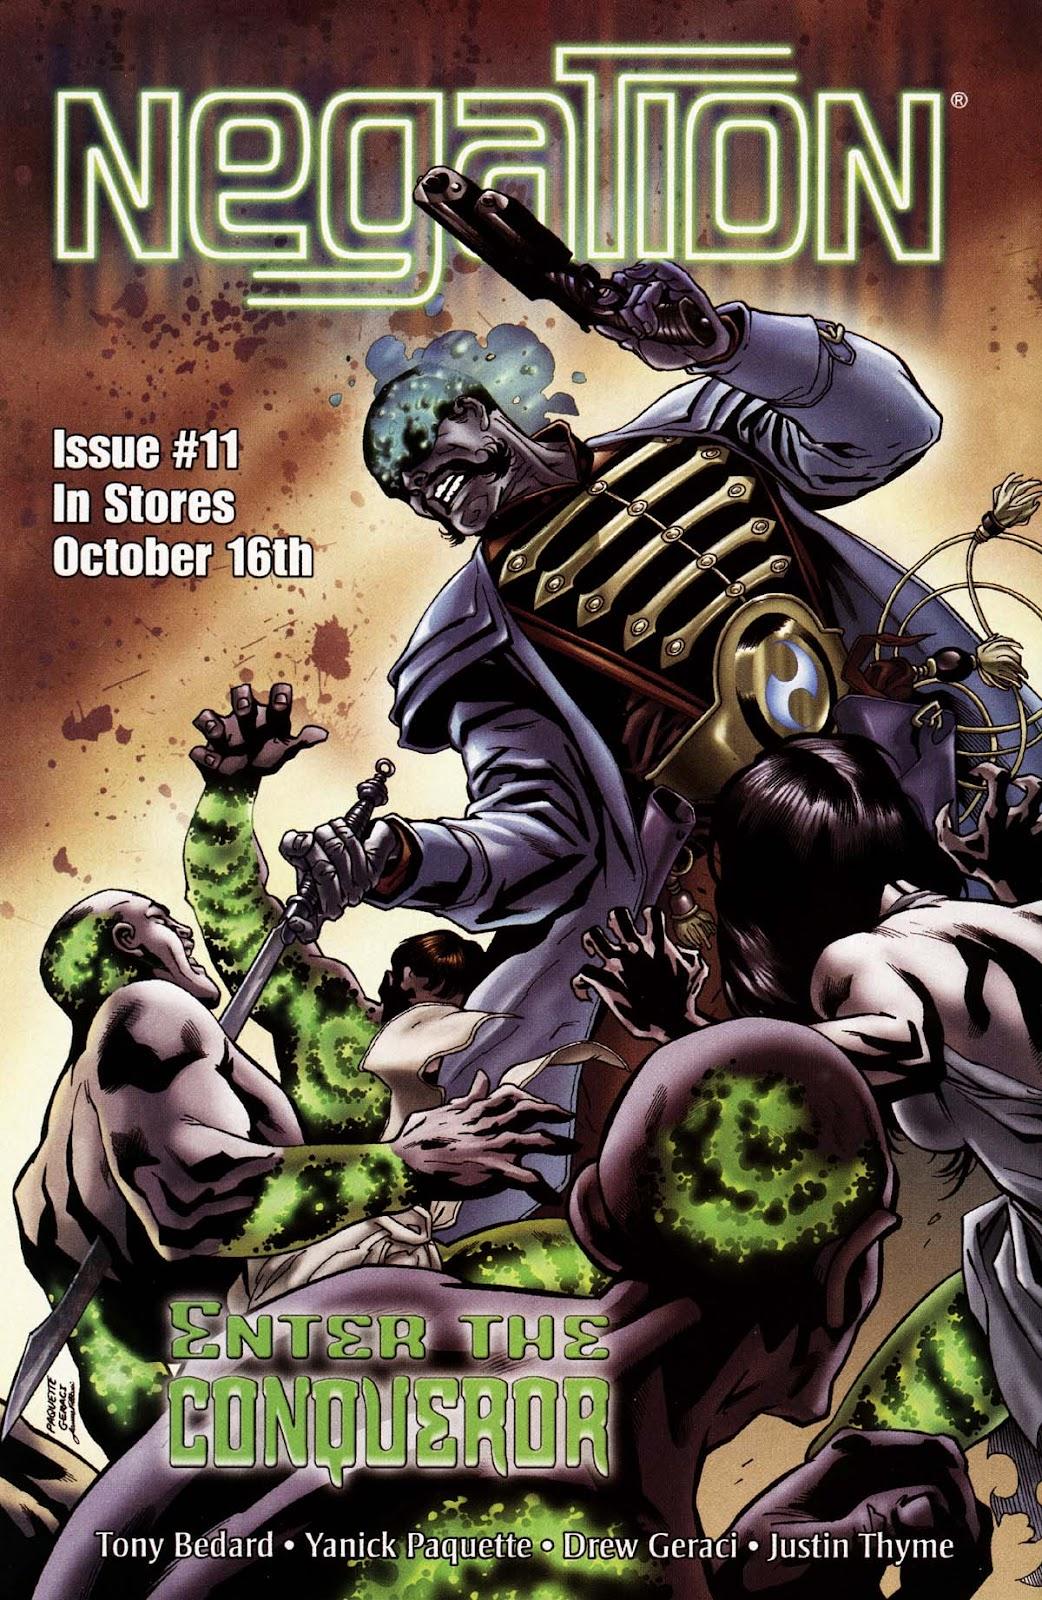 Read online Negation Lawbringer comic -  Issue # Full - 28